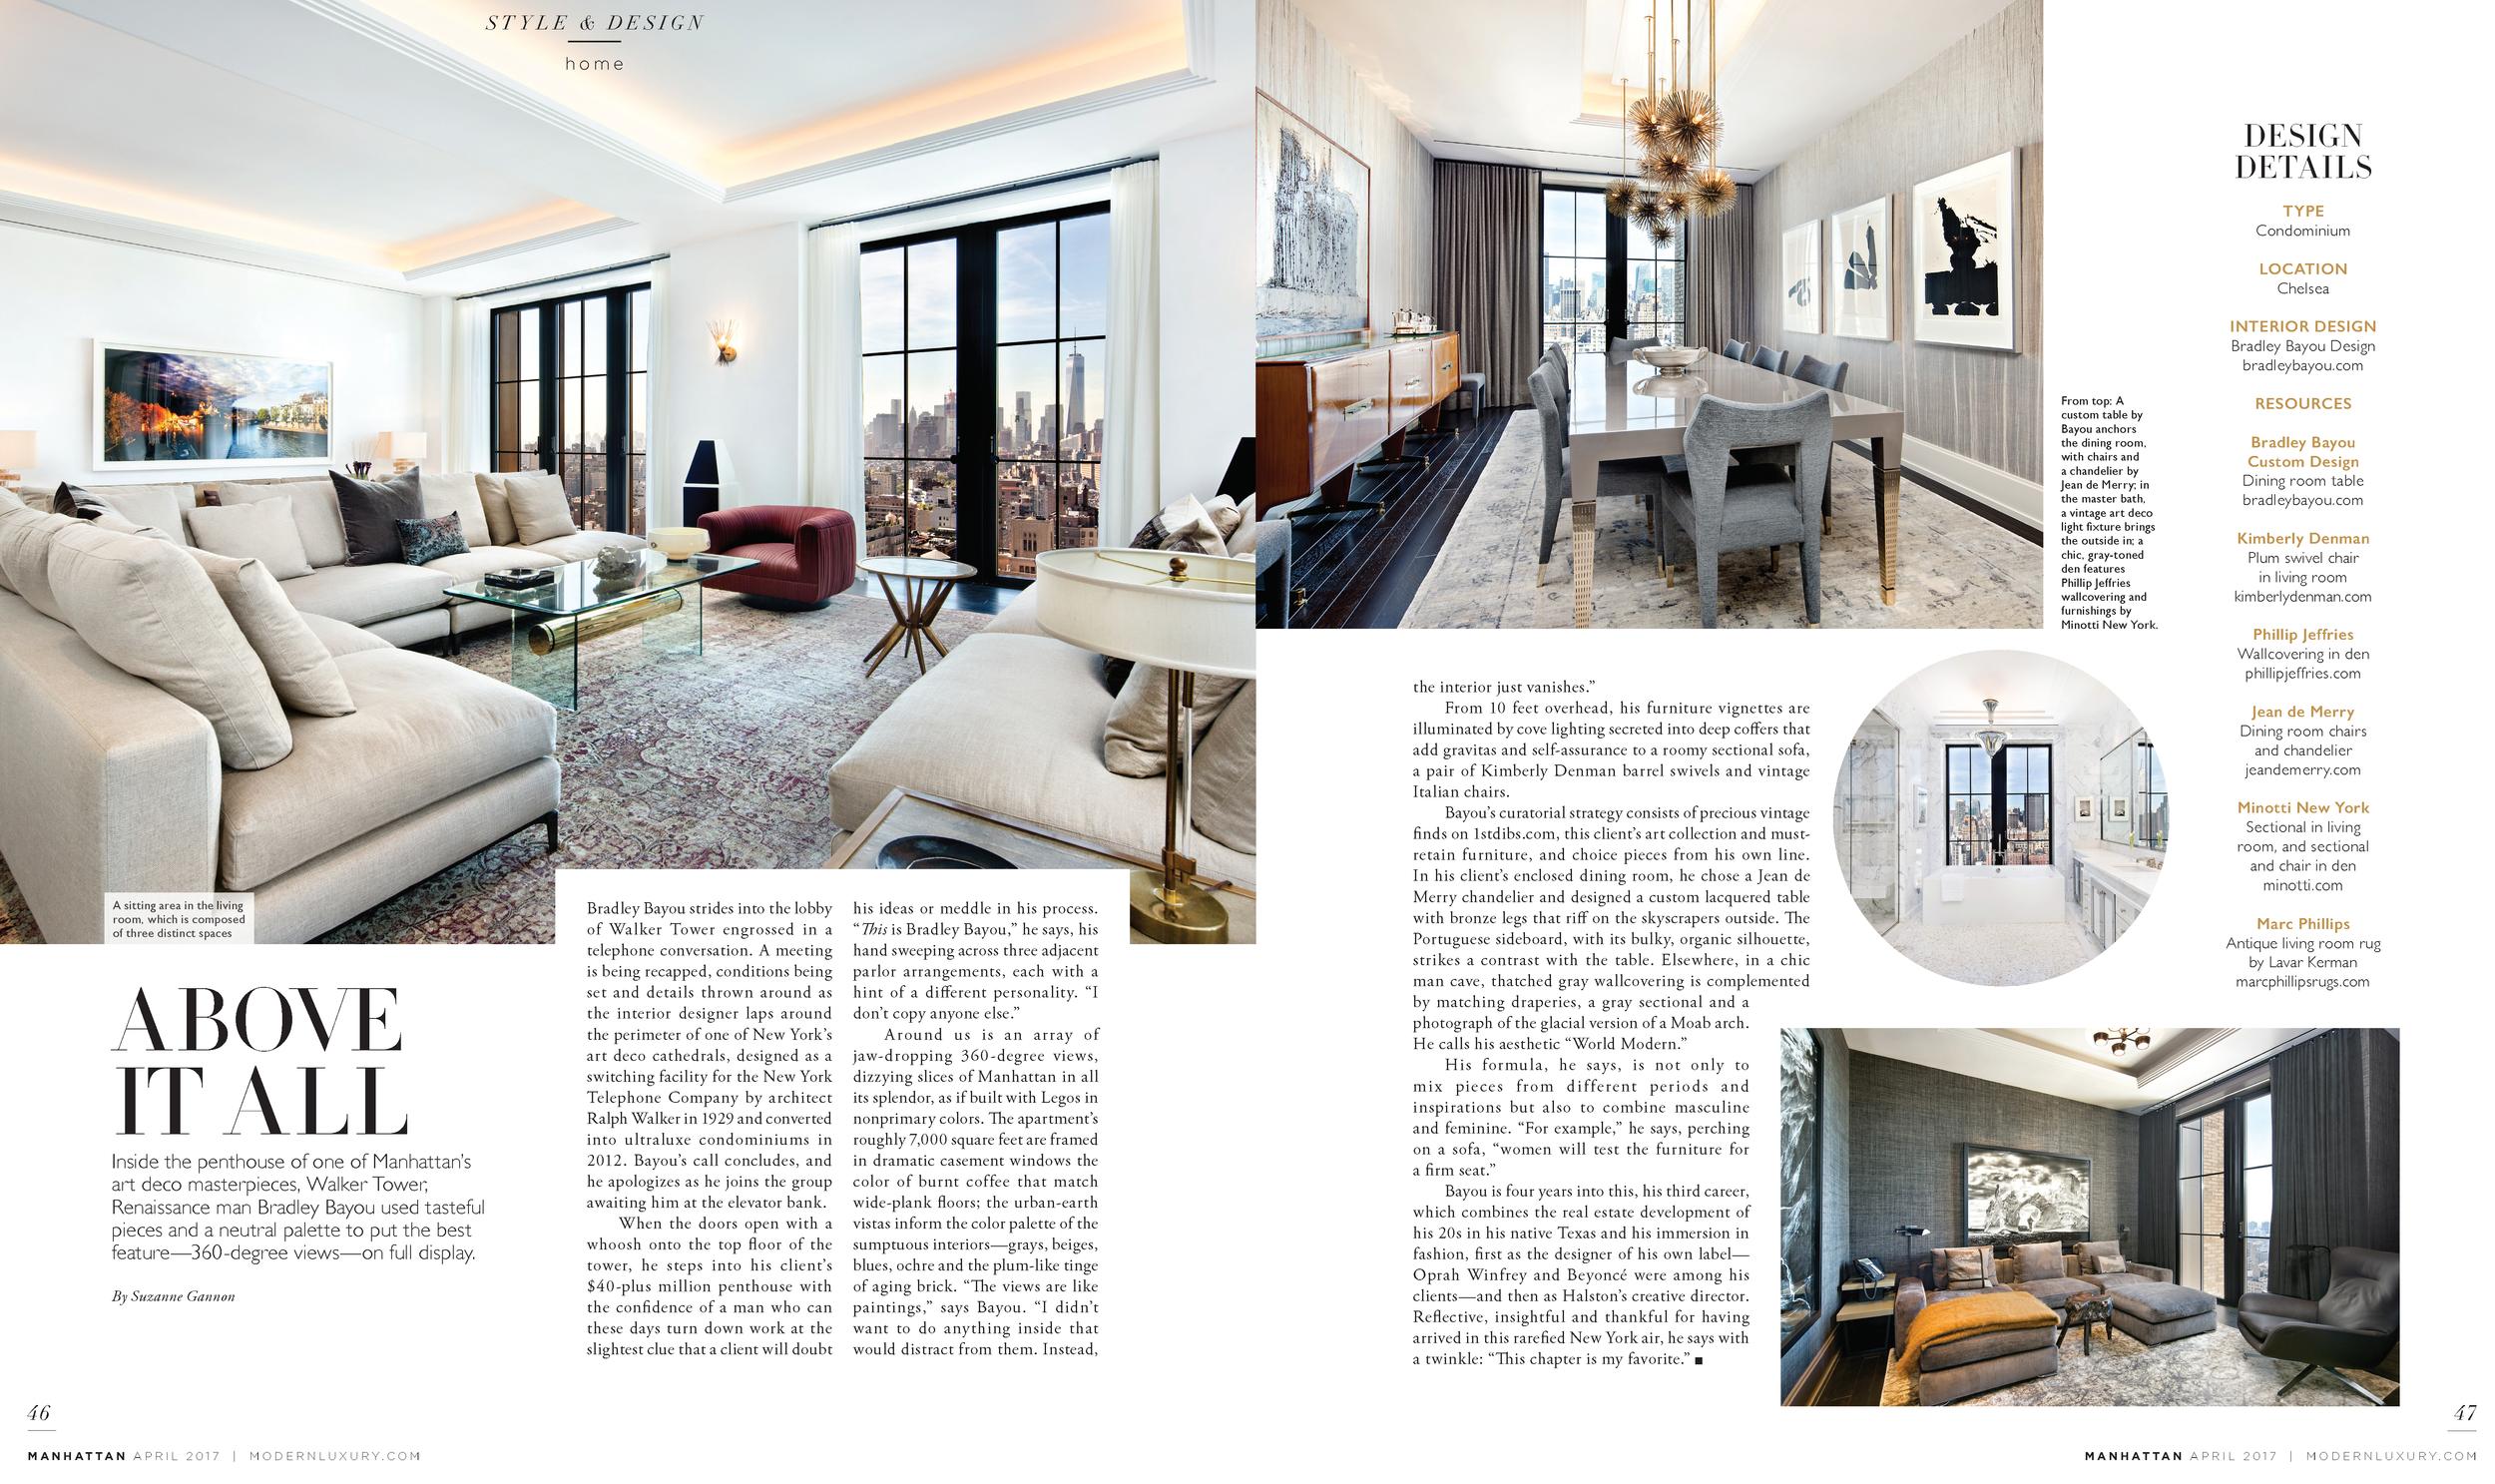 BB_Manhattan Magazine_April 2017_Page_2.png